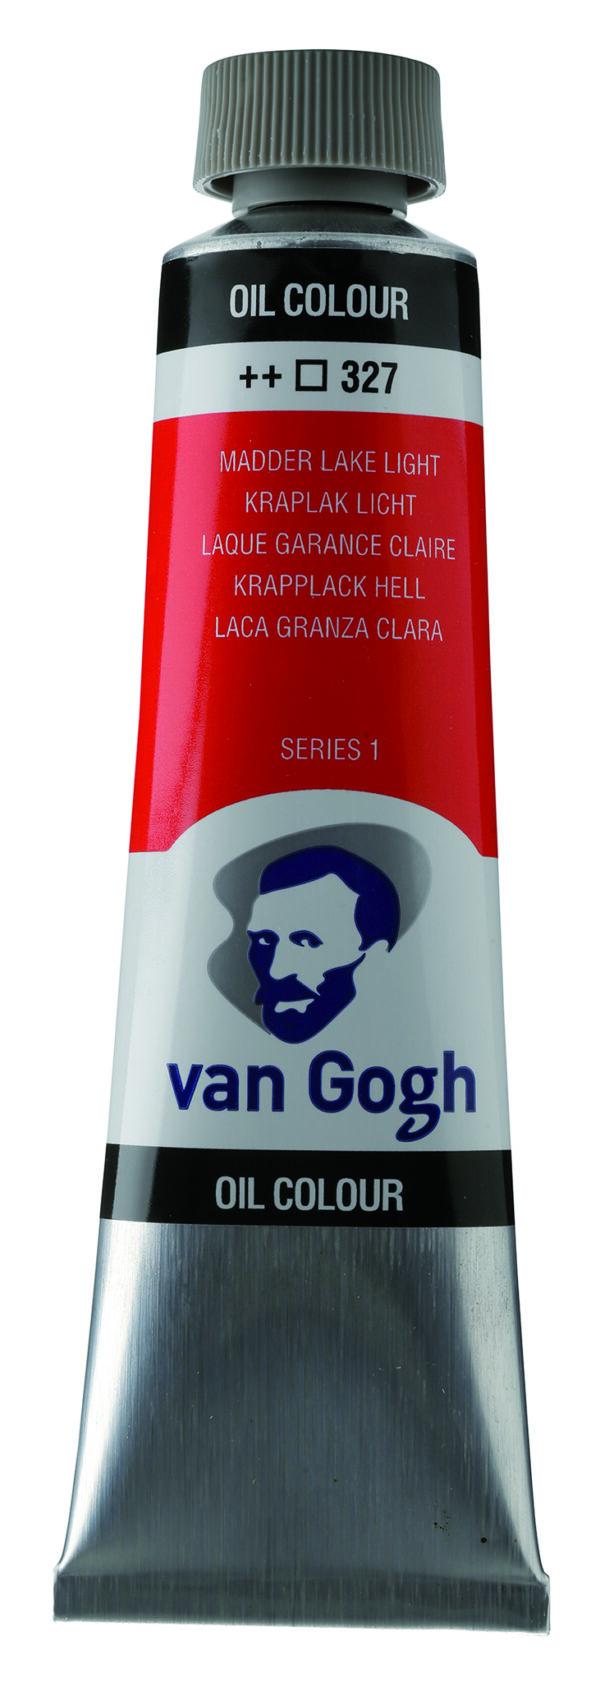 Van Gogh 327 Madder lake Light - 40 ml